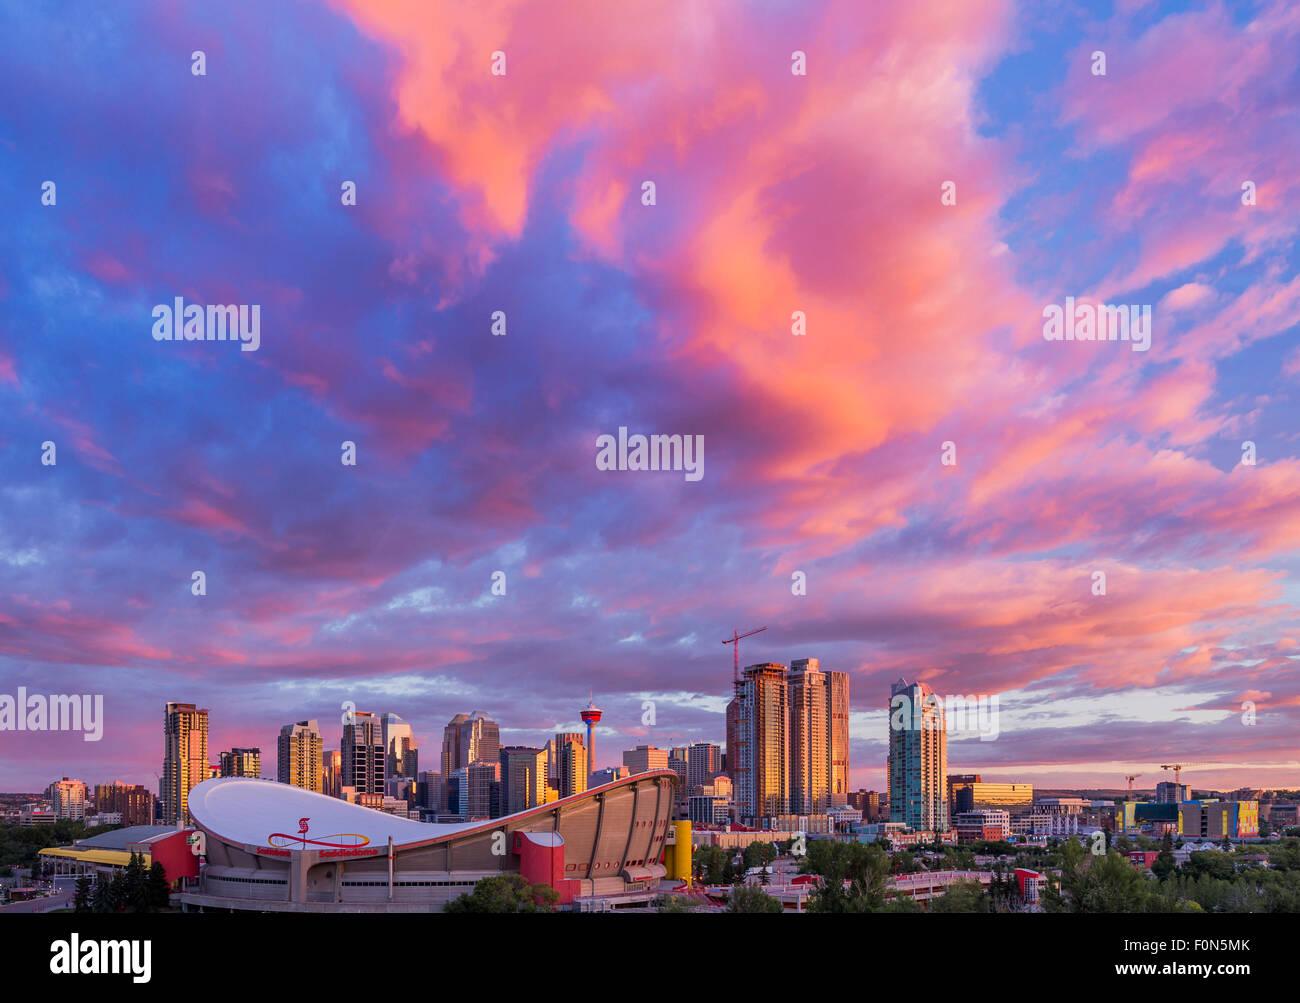 Skyline von Calgary in der Morgendämmerung, Calgary, Alberta, Kanada Stockbild